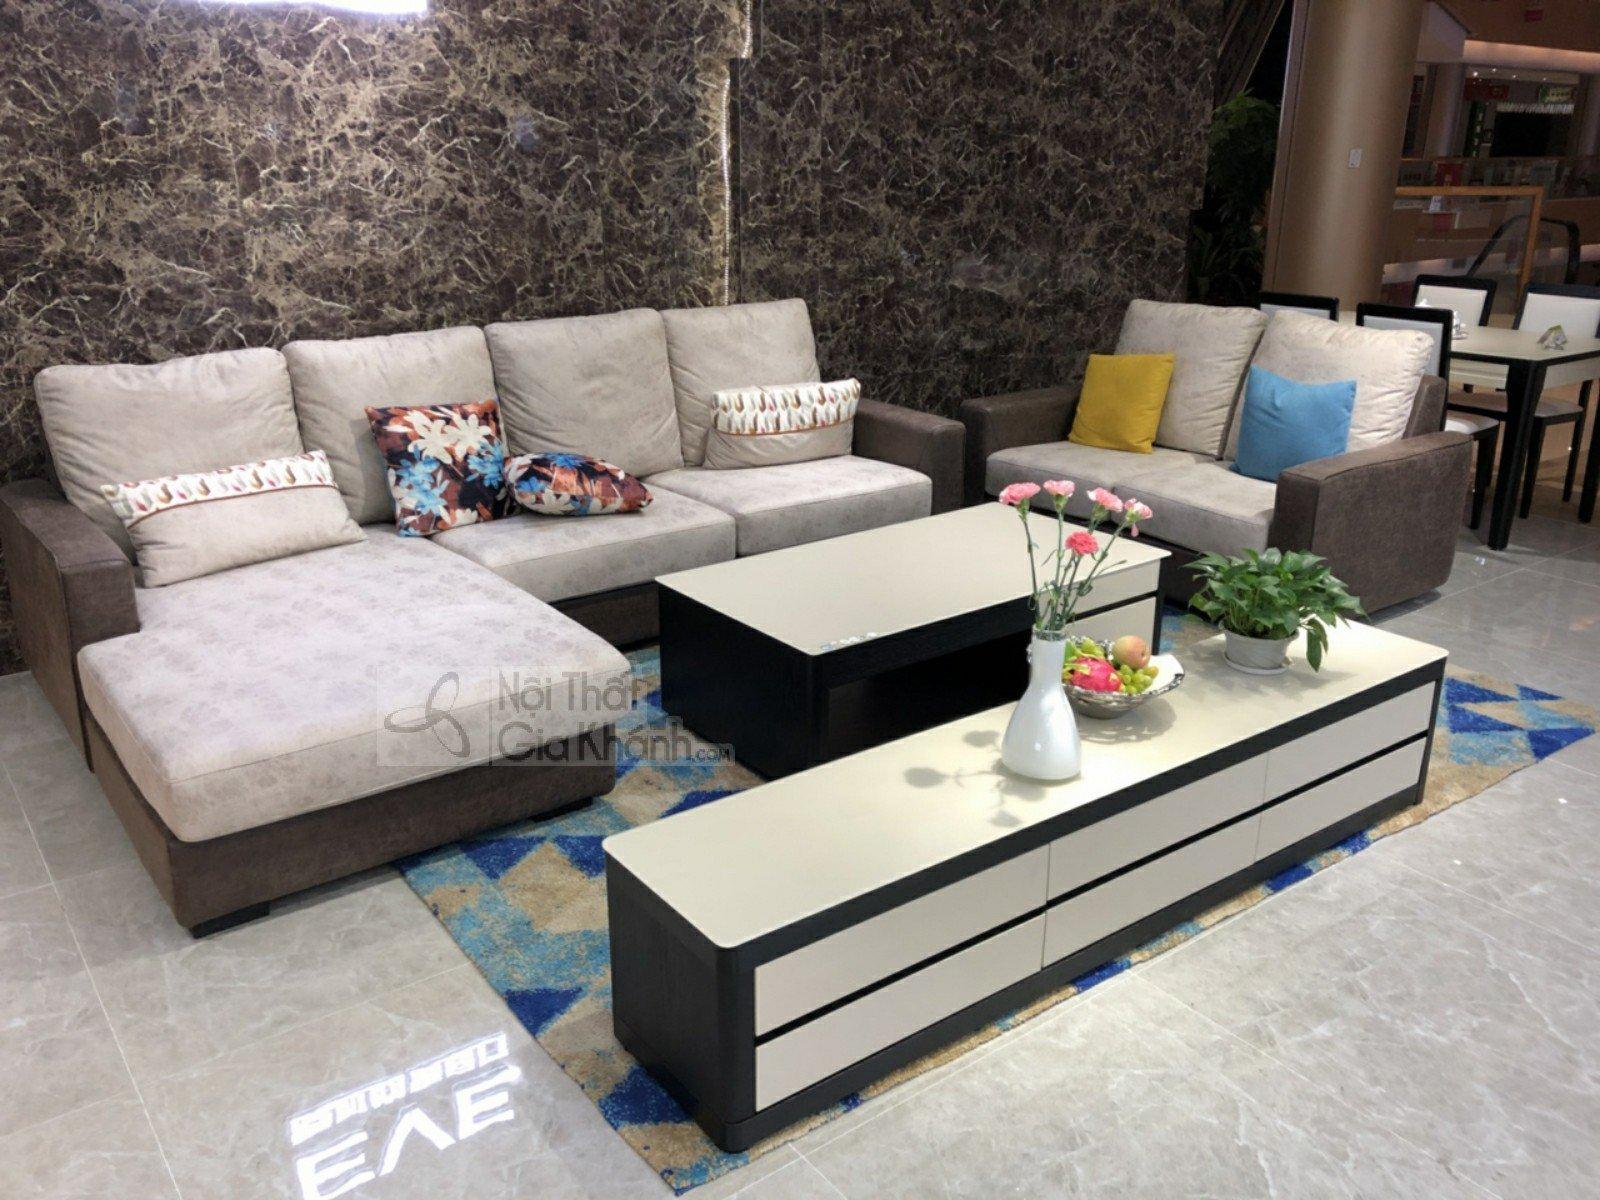 SOFA 2 BĂNG GÓC PHẢI NỈ NANO CHỐNG THẤM NƯỚC MR813A-SF - sofa da ni nano MR813A SF